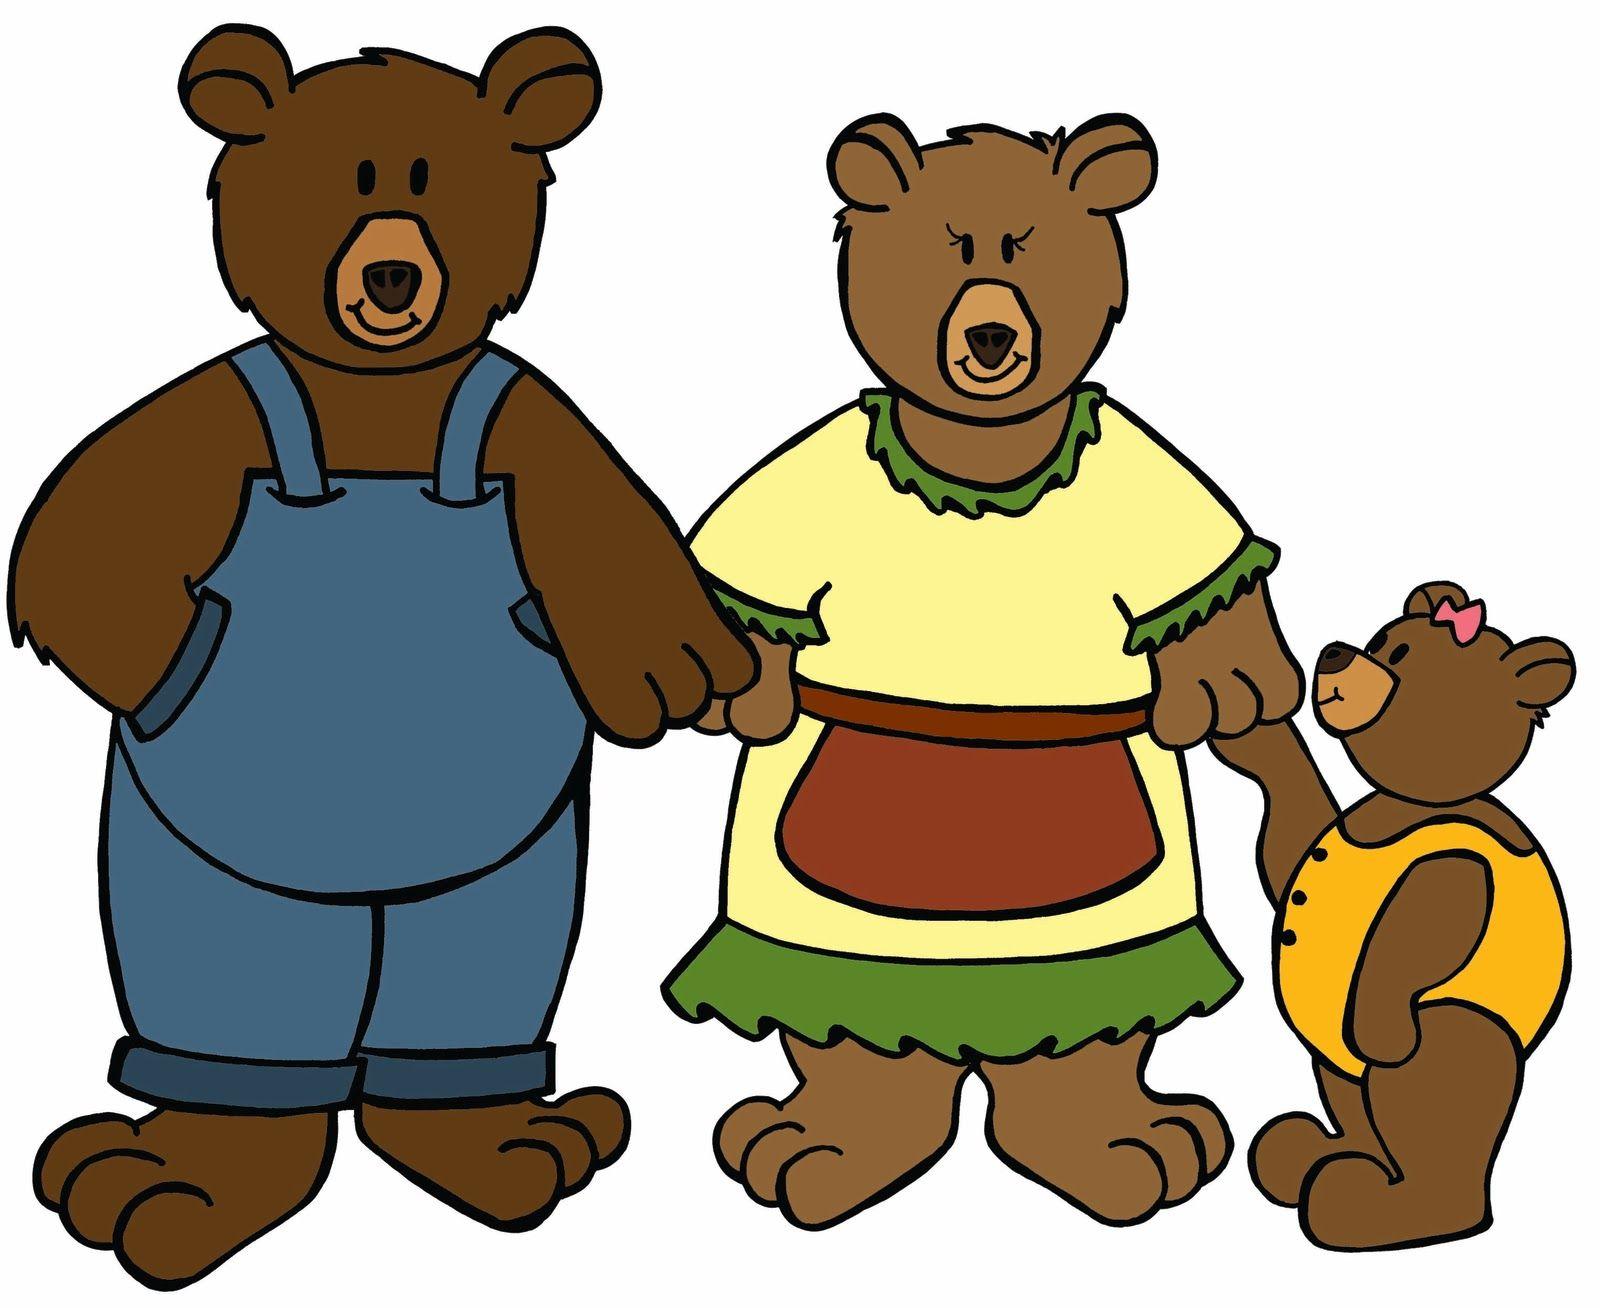 bear pictures clip art google pretra ivanje djed i dje ak u rh pinterest co uk In Thier House and Goldilocks the Three Bears Clip Art In Thier House and Goldilocks the Three Bears Clip Art